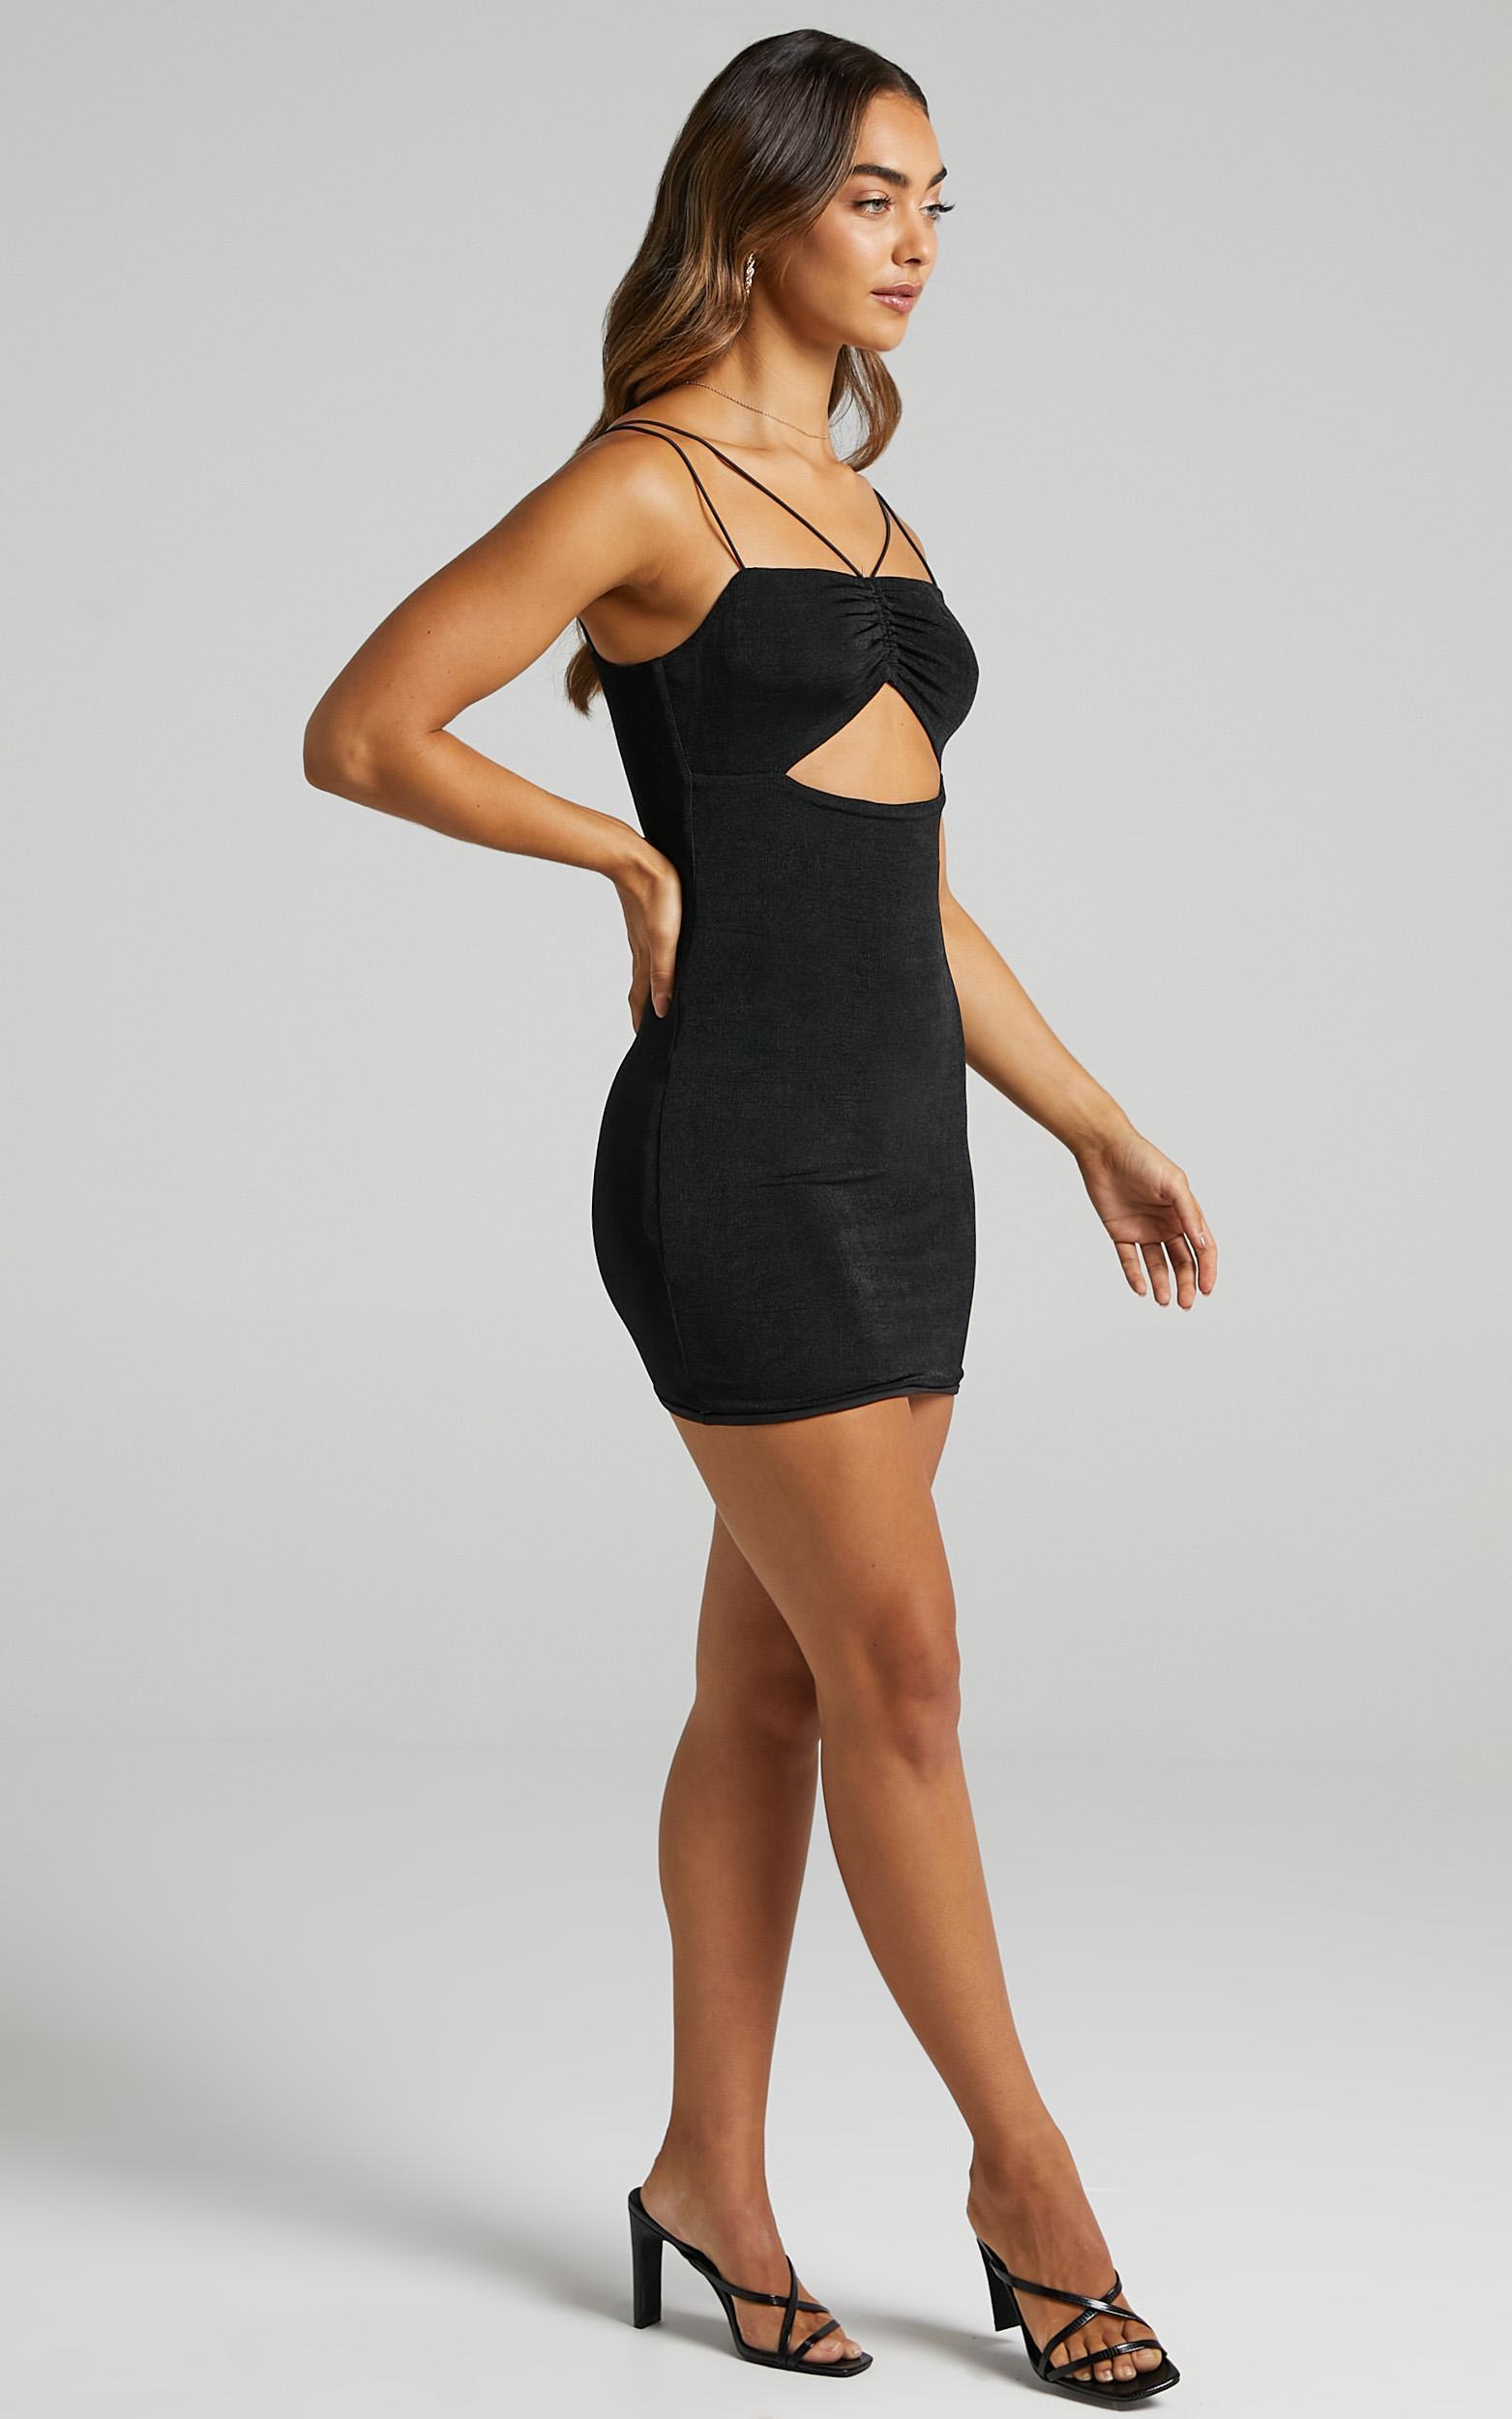 Rois Dress in Black - 6 (XS), Black, hi-res image number null